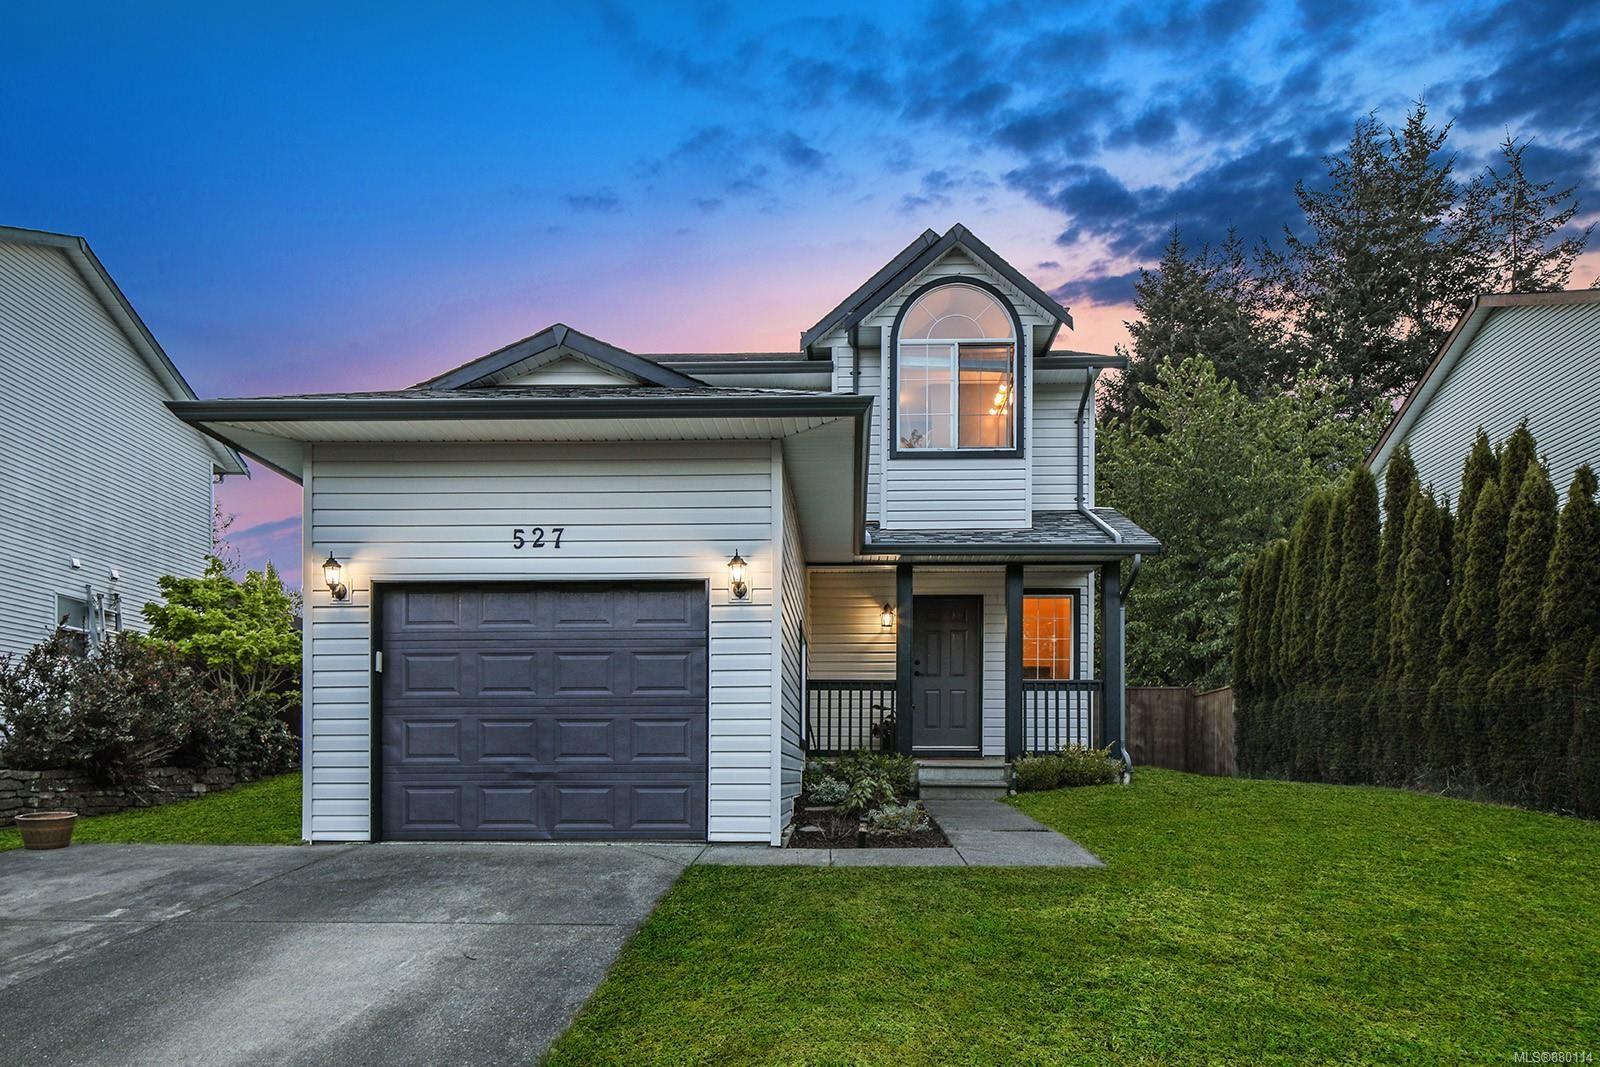 Main Photo: 527 Deerwood Pl in : CV Comox (Town of) House for sale (Comox Valley)  : MLS®# 880114